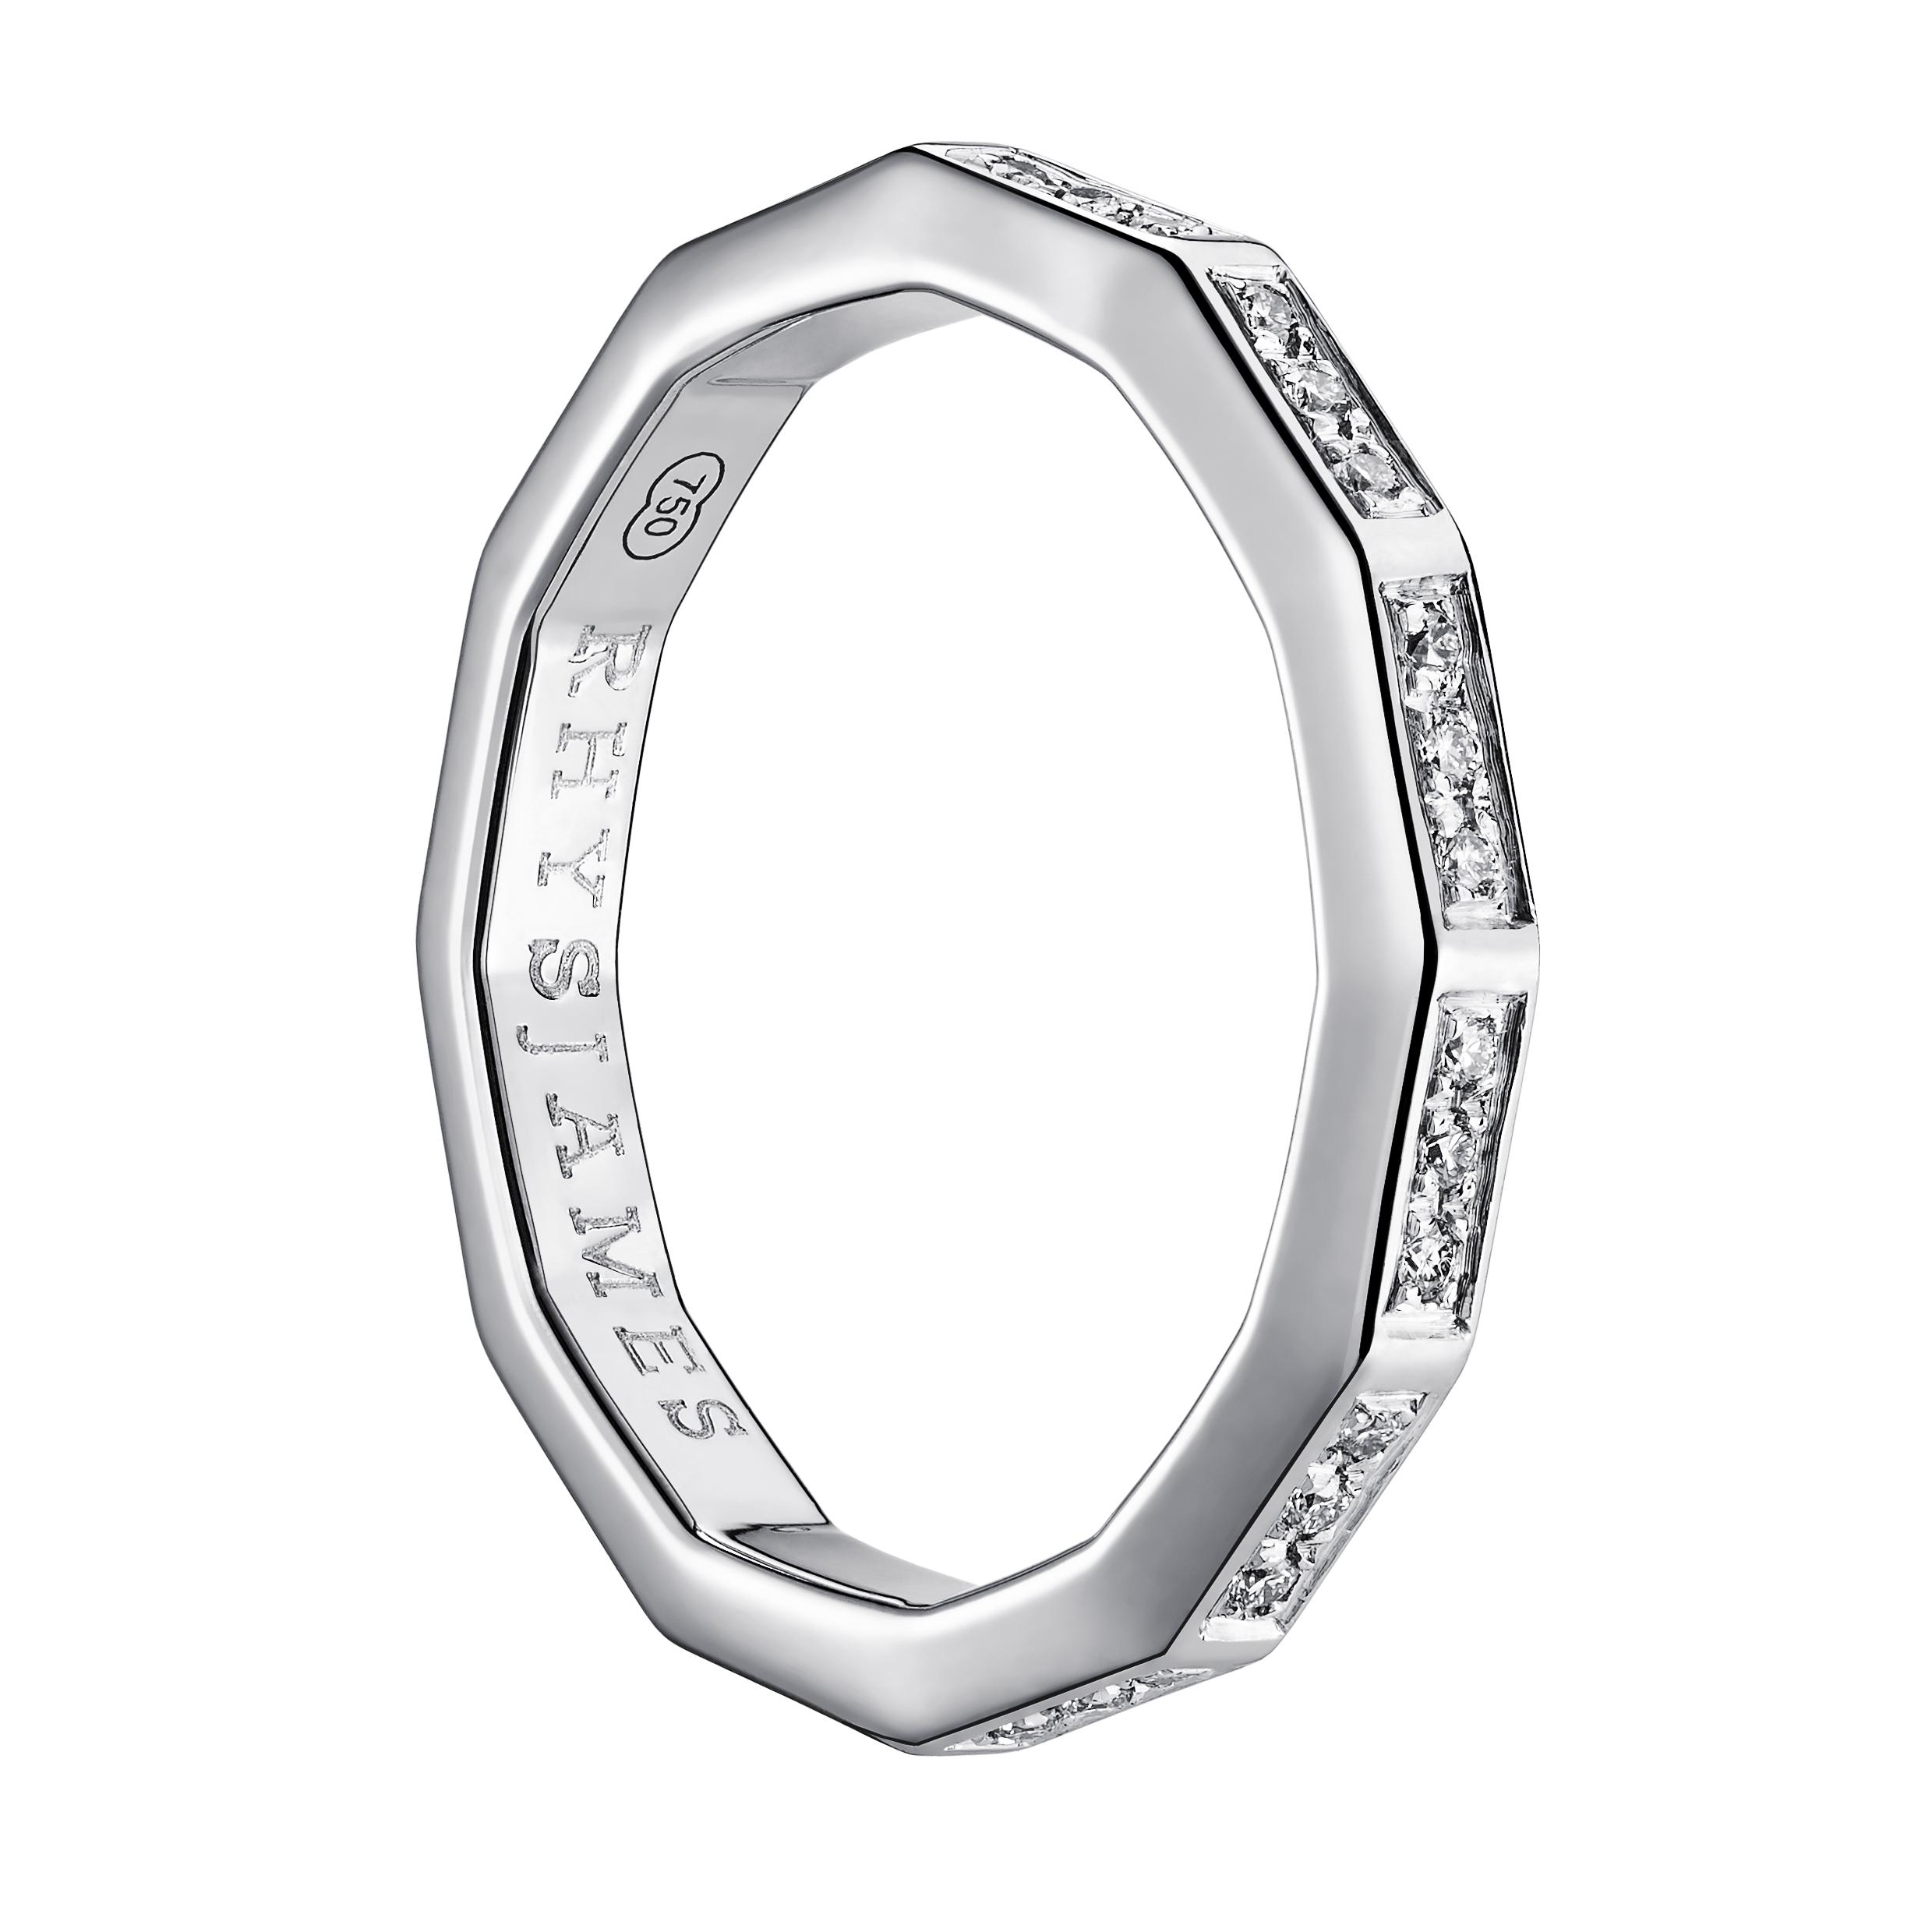 Voyager Ring | White Gold & Diamonds